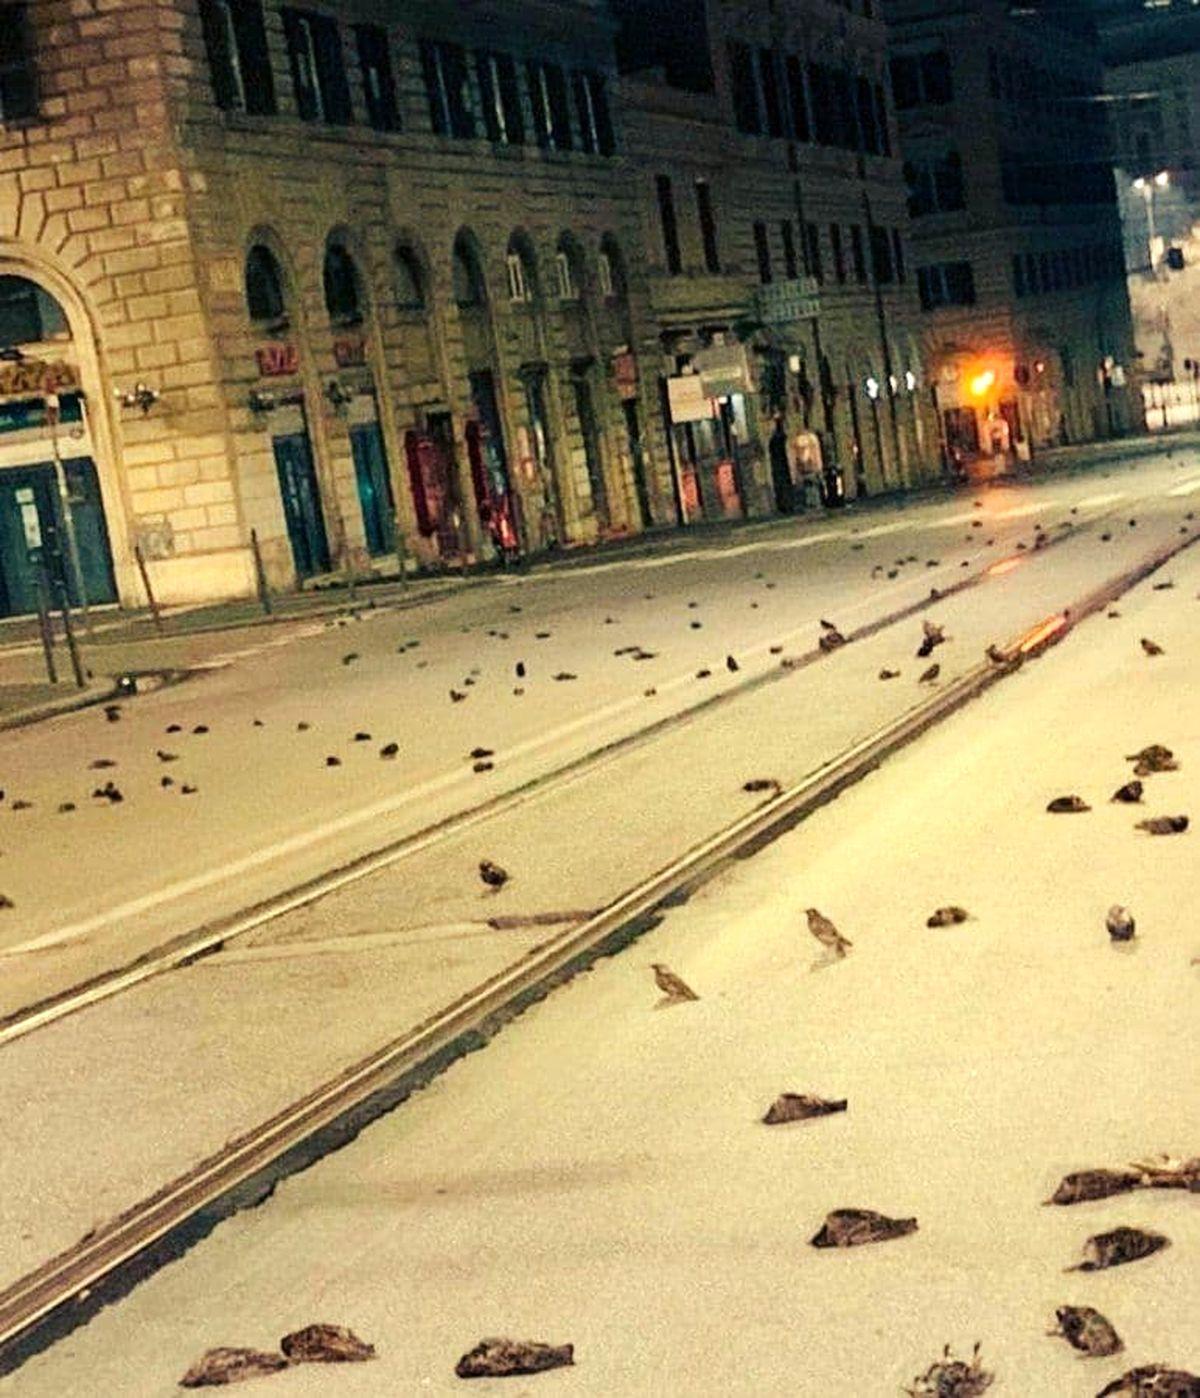 قتل عام کریسمسی پرندگان در رم! +عکس